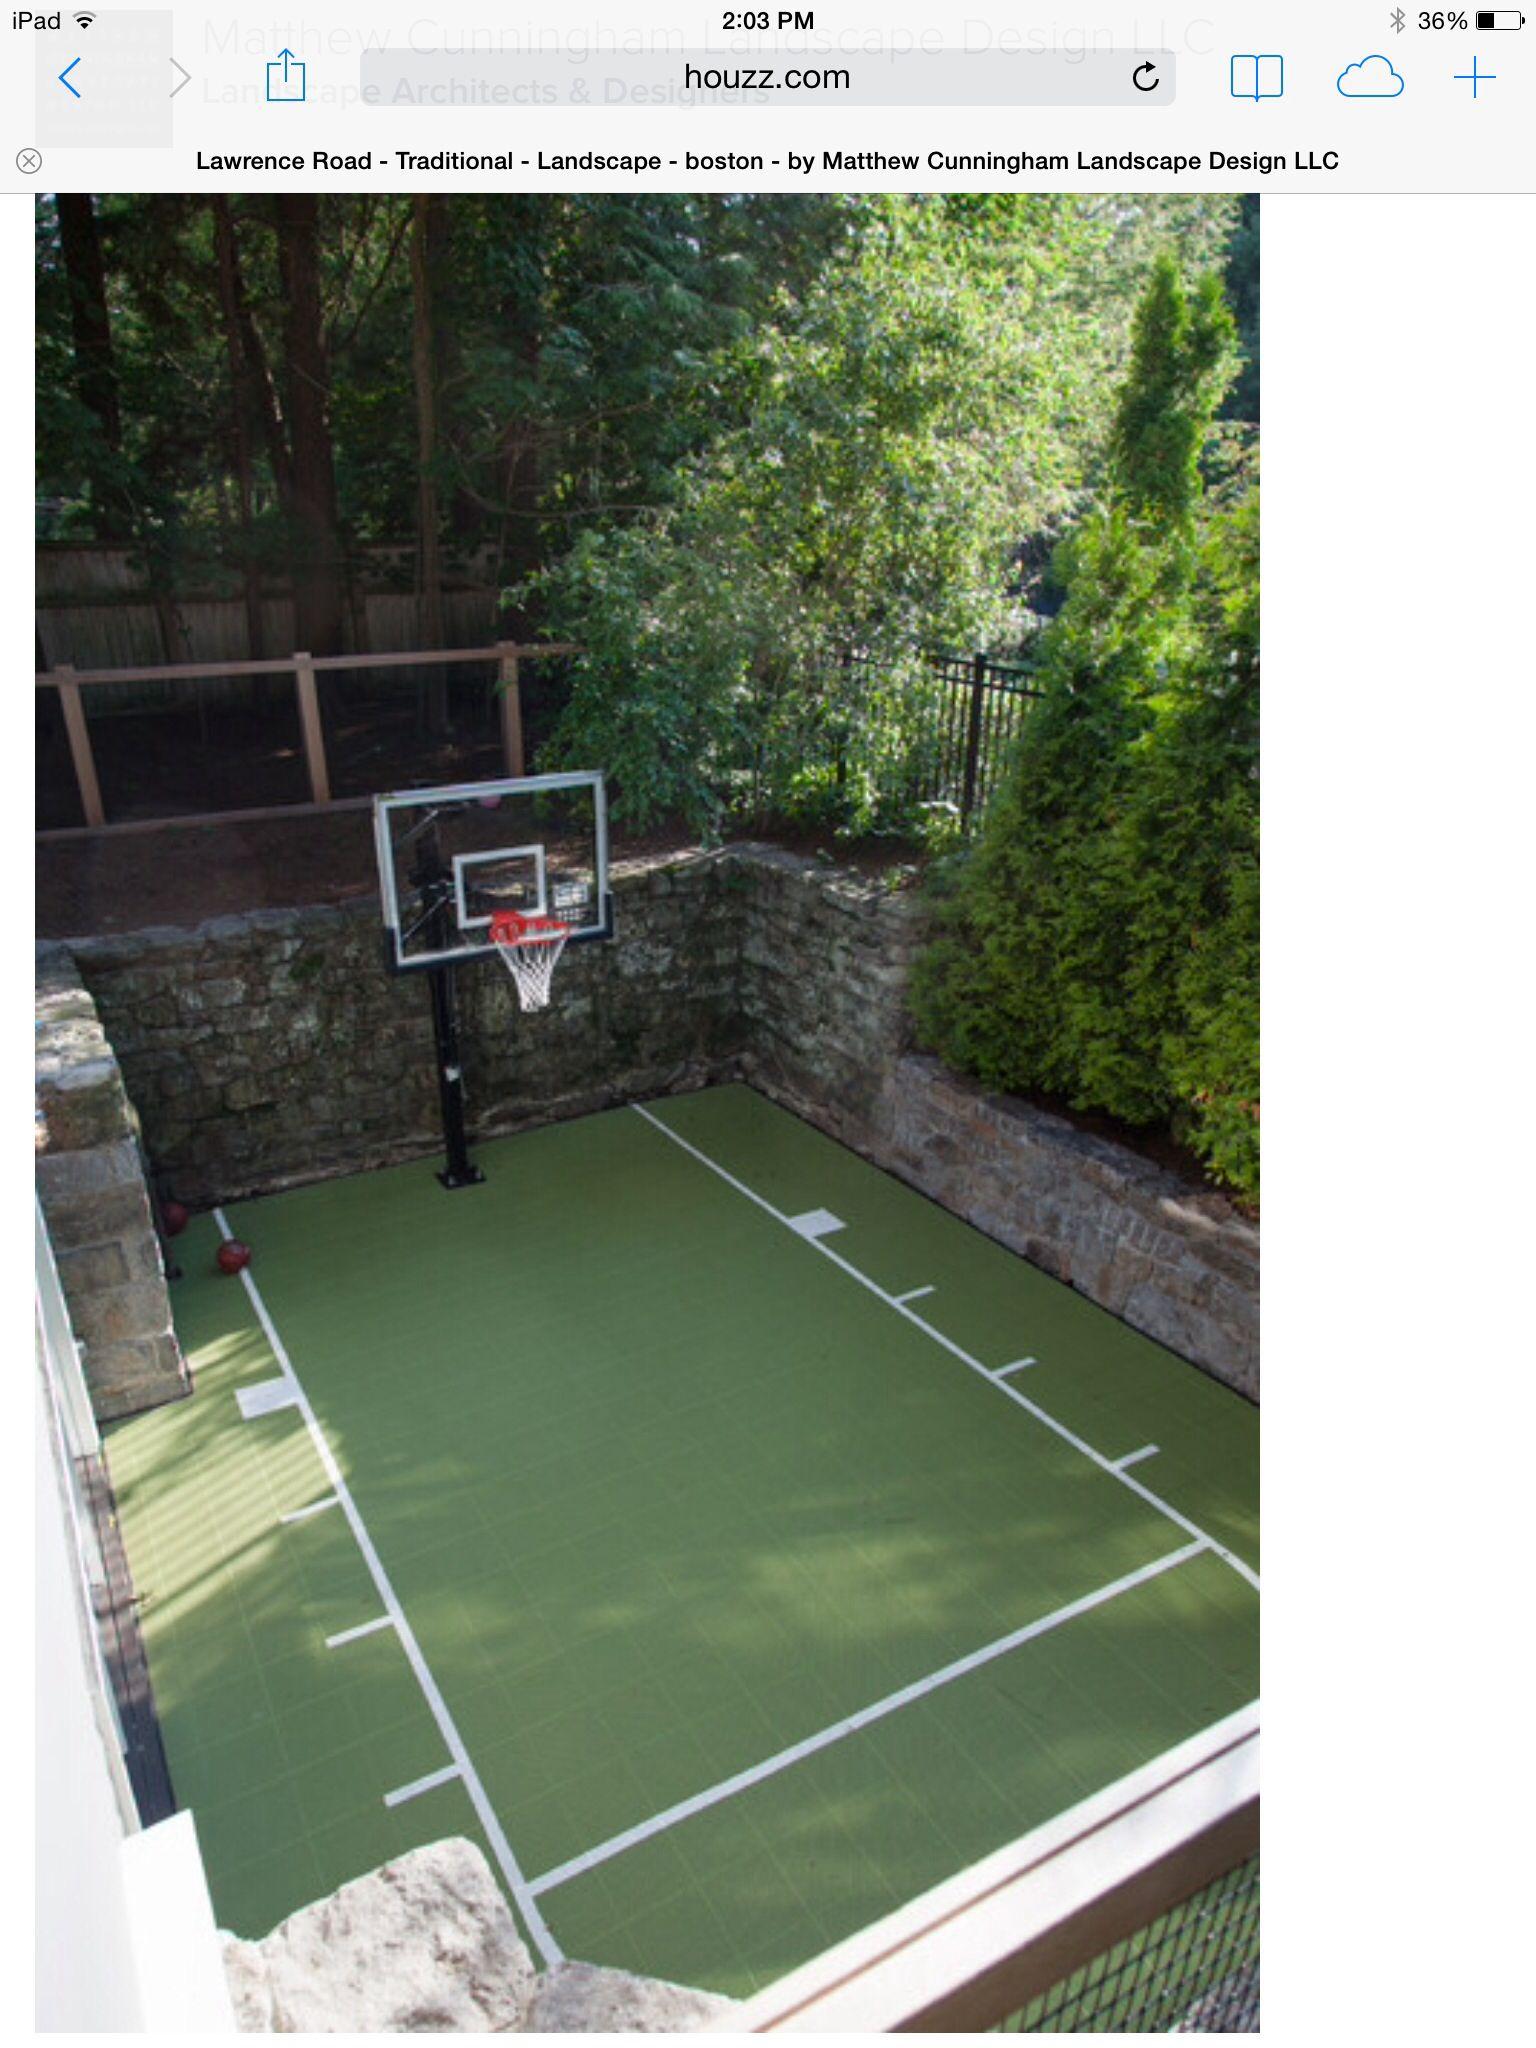 small sport court backyard pinterest backyard and house